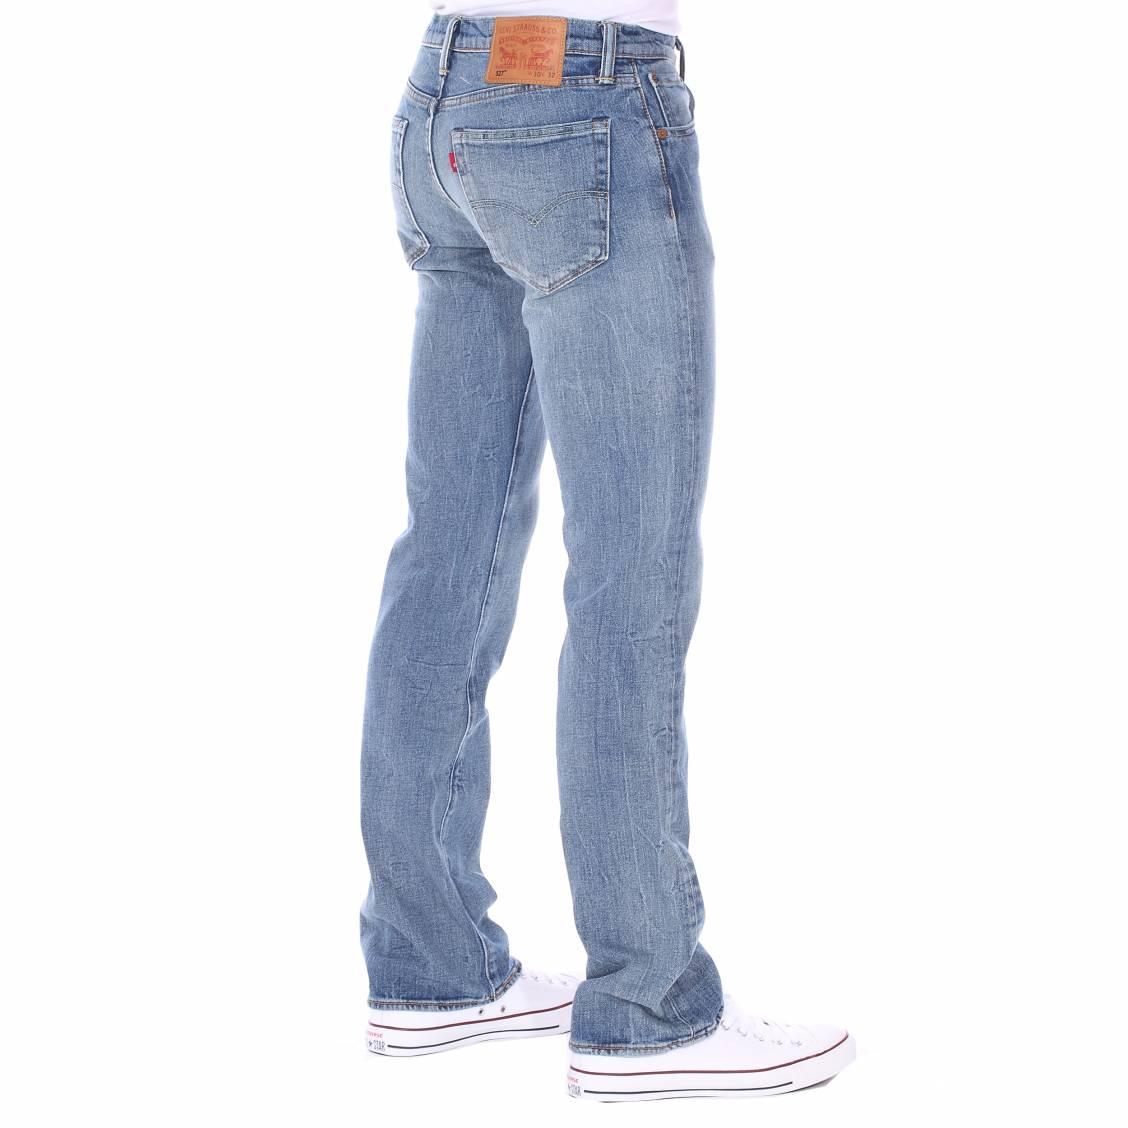 jean levi 39 s 527 low boot cut fine tuned bleu clair rue des hommes. Black Bedroom Furniture Sets. Home Design Ideas